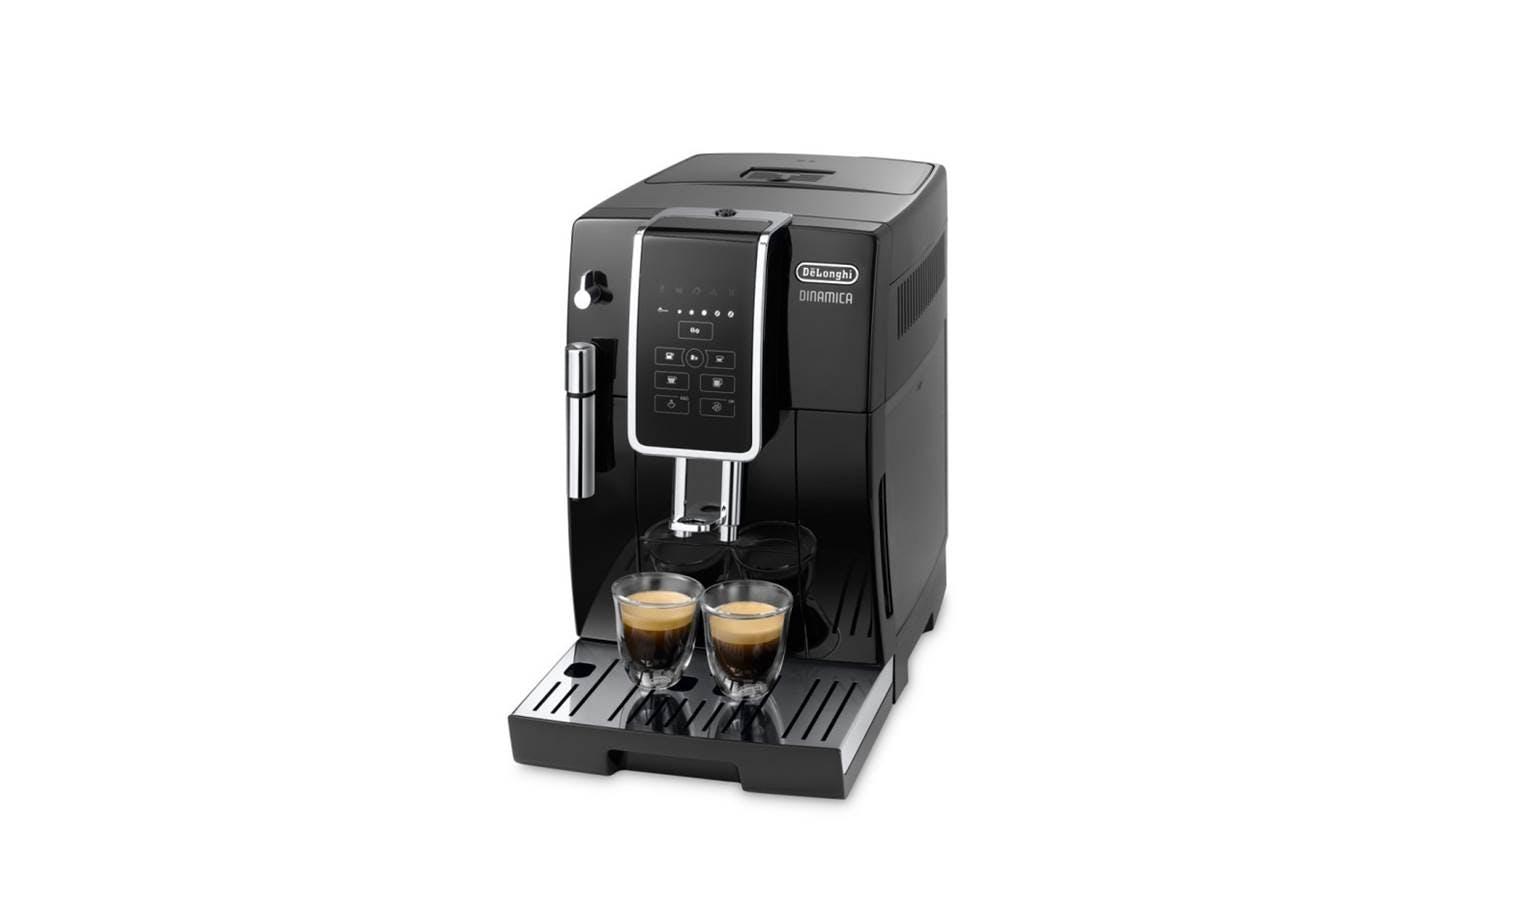 DeLonghi ECAM350.15.B Espresso Coffee Machine